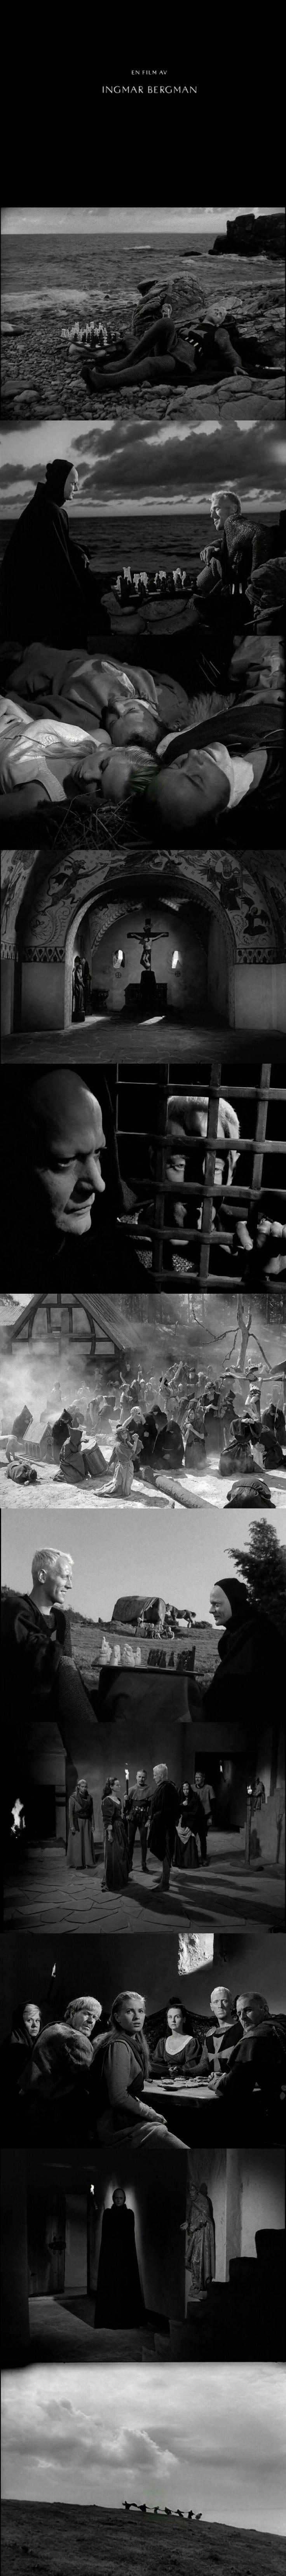 Thr Seventh Seal (1957) Directed by Ingmar Bergman.